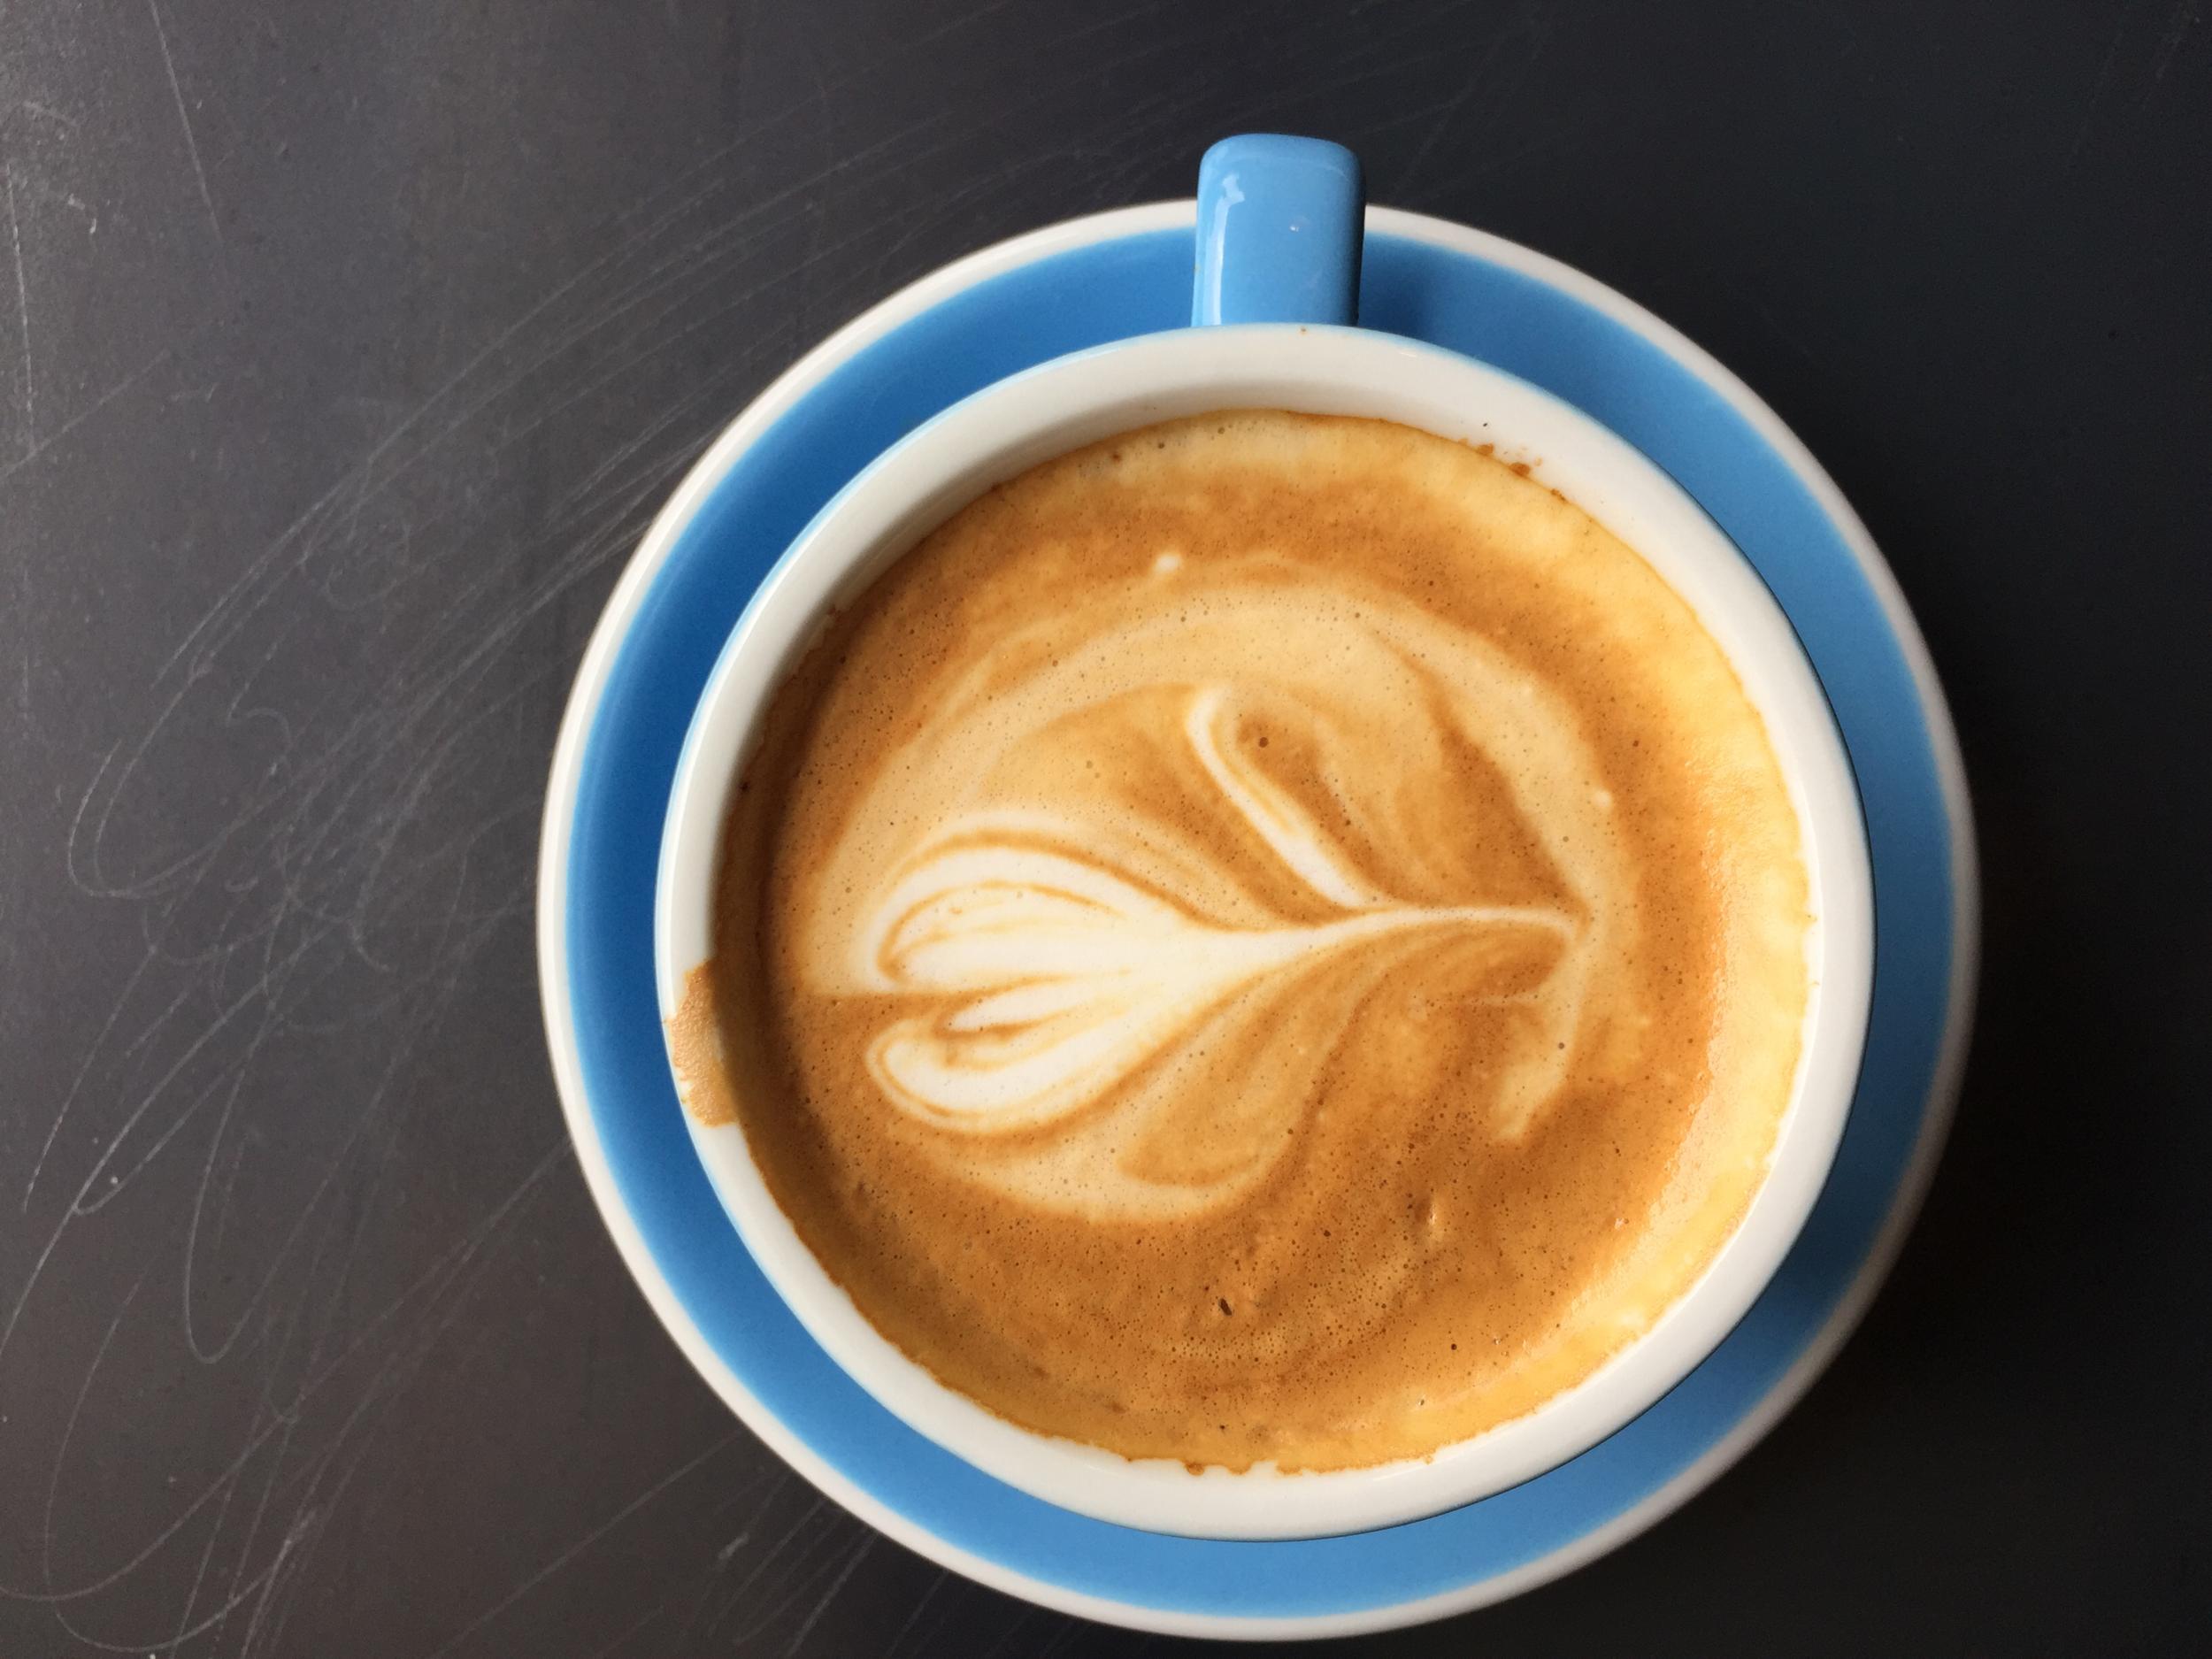 Cappuccino from Coffee Shop in Walnut Creek, CA